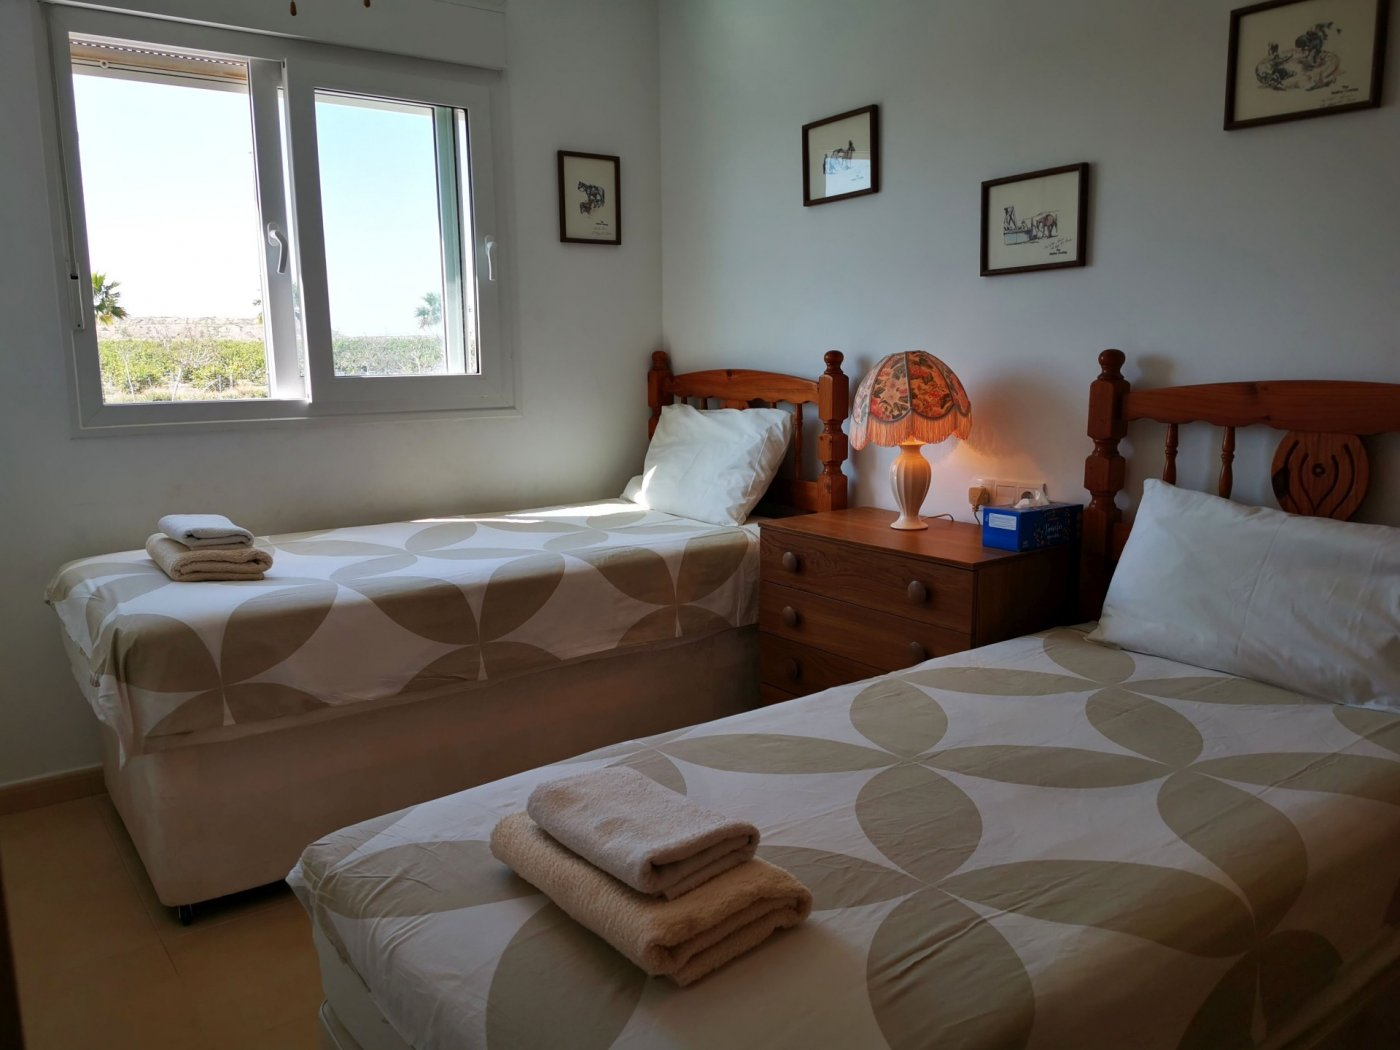 Gallery Image 10 of Key-Ready 2 Bedroom Apartment Overlooking the Citrus Groves in Jardin 10, Condado de Alhama